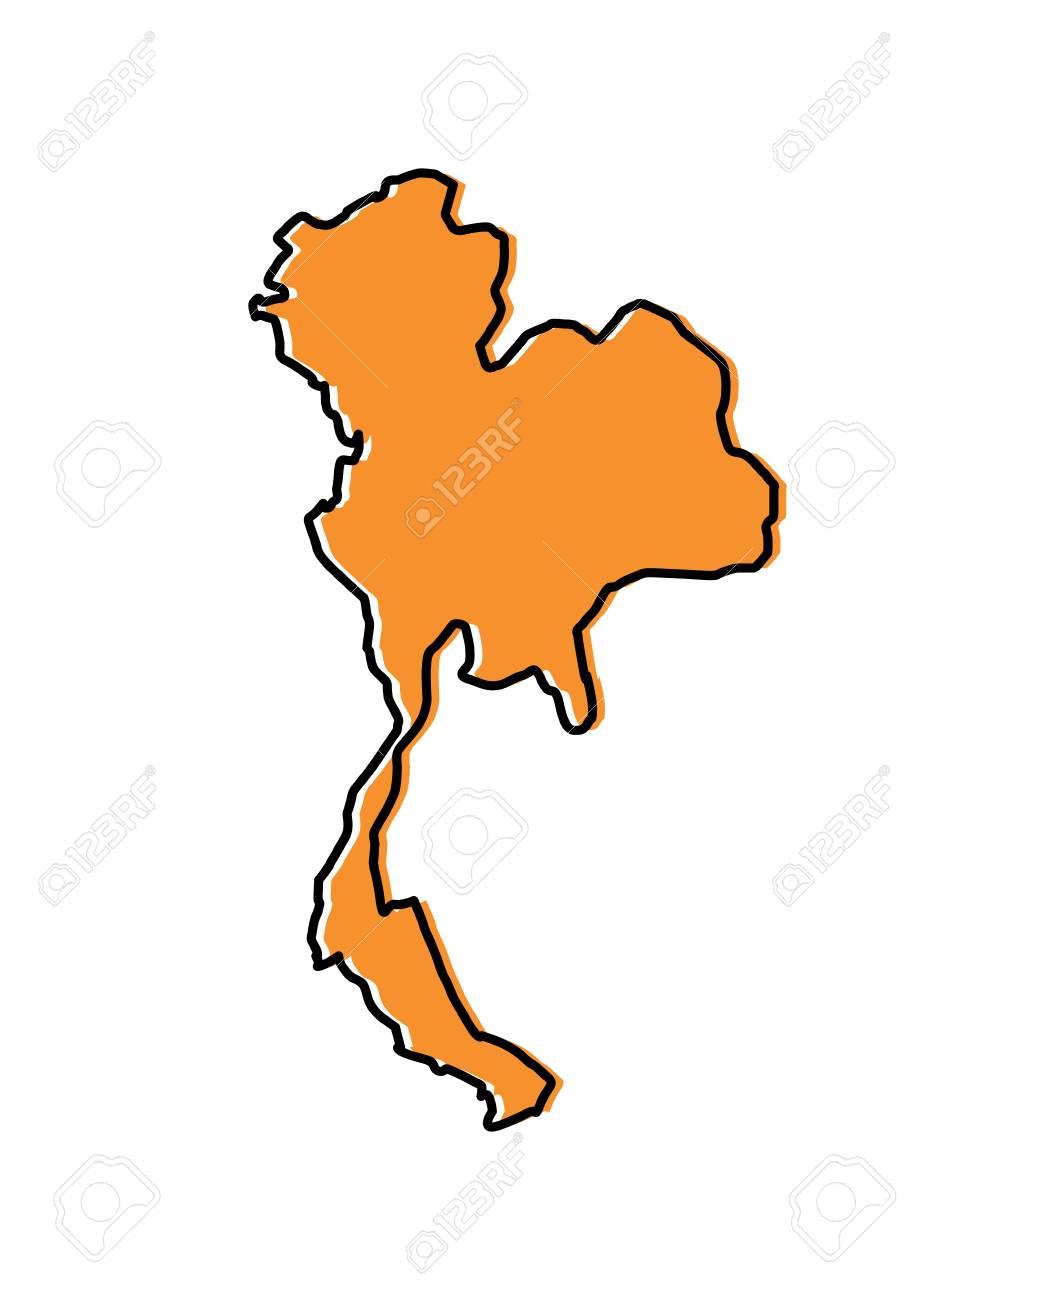 Thailand map location, Asia travel destination vector illustration